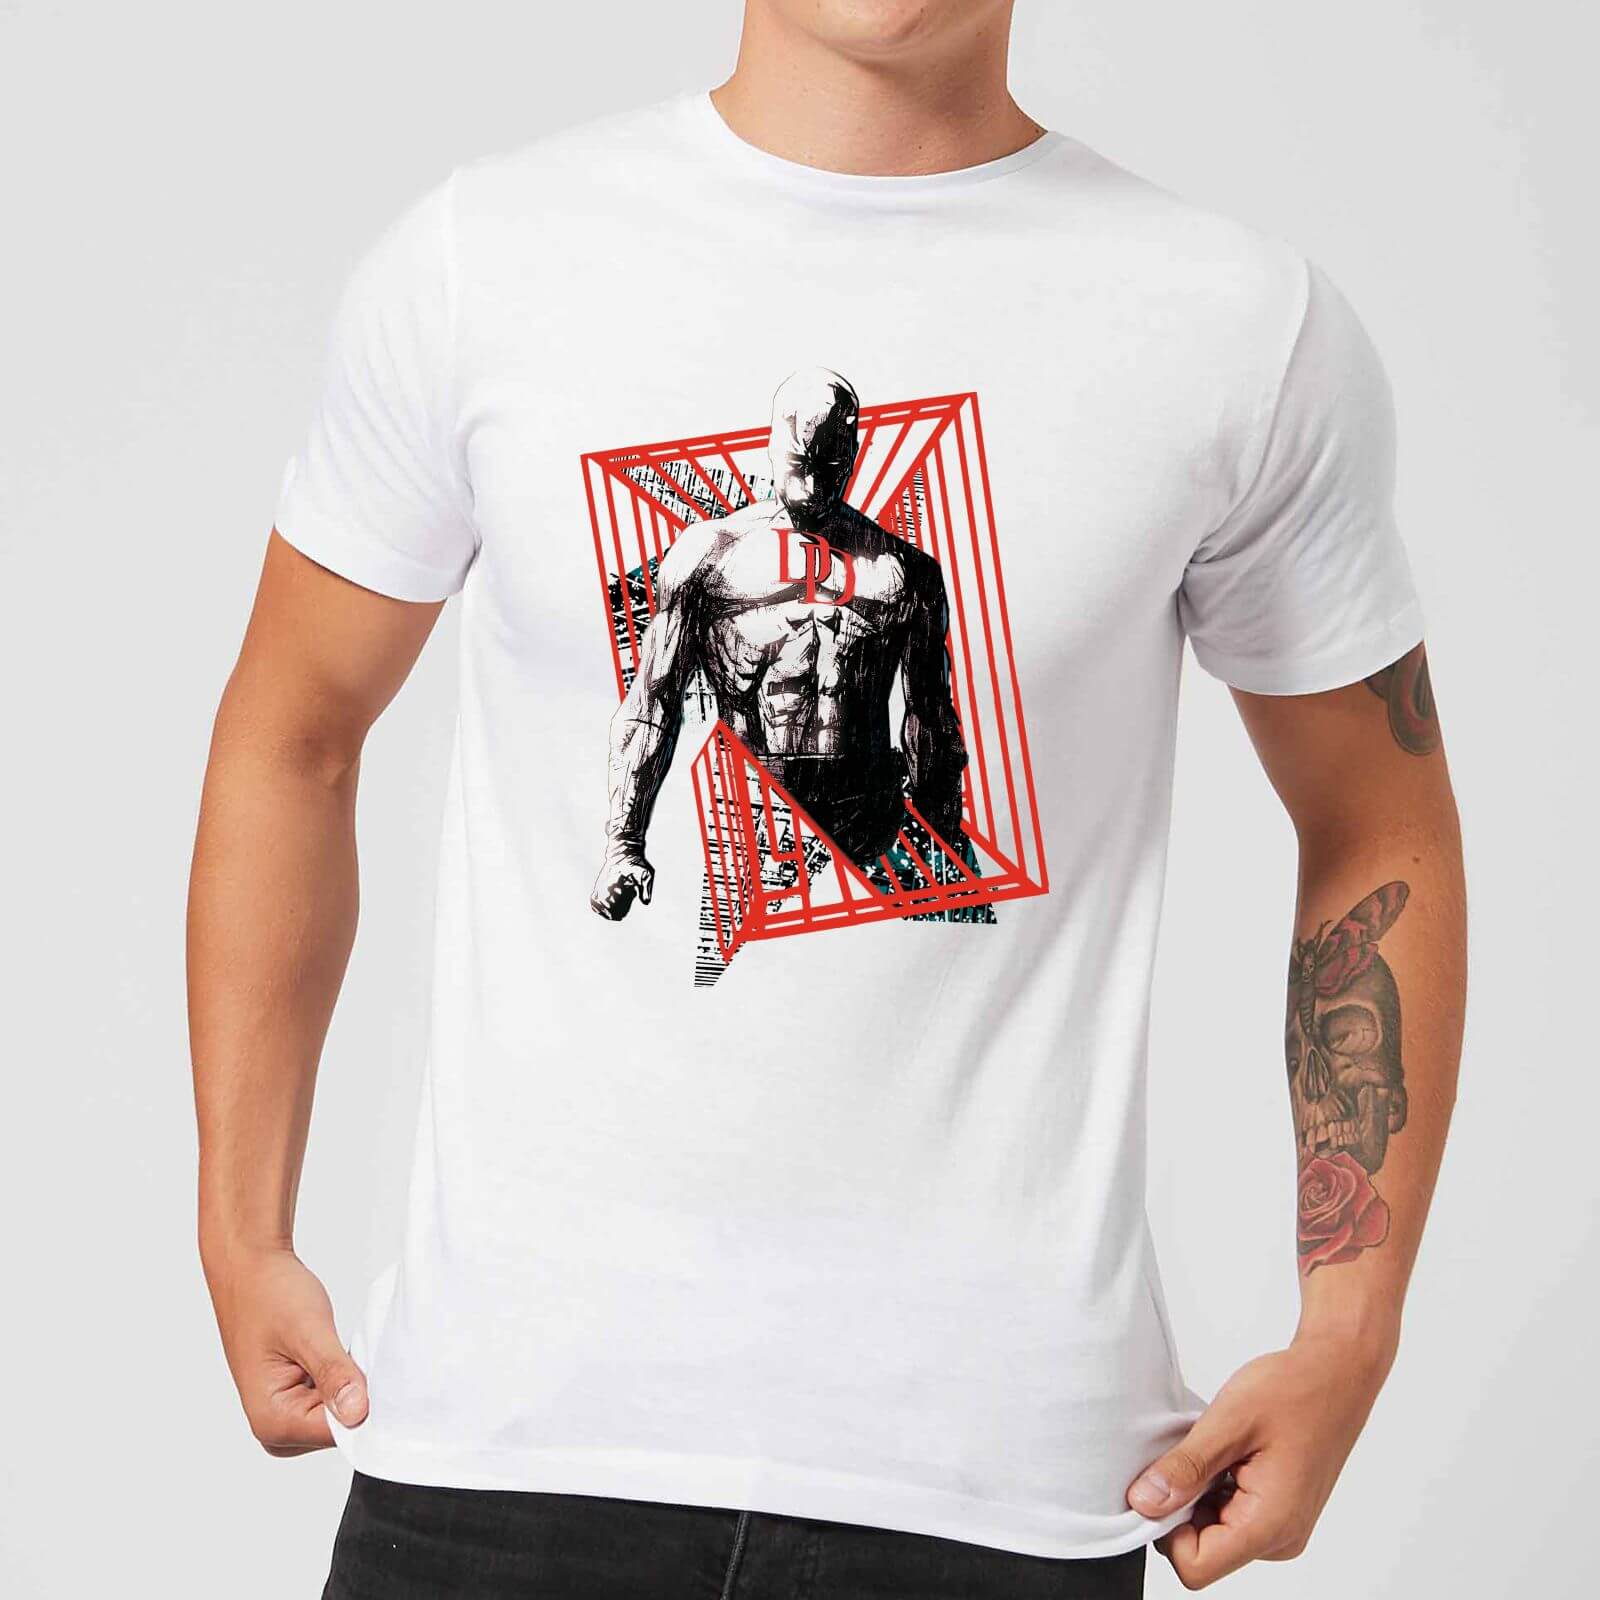 OfferteWeb.click 87-t-shirt-marvel-knights-daredevil-cage-bianco-uomo-l